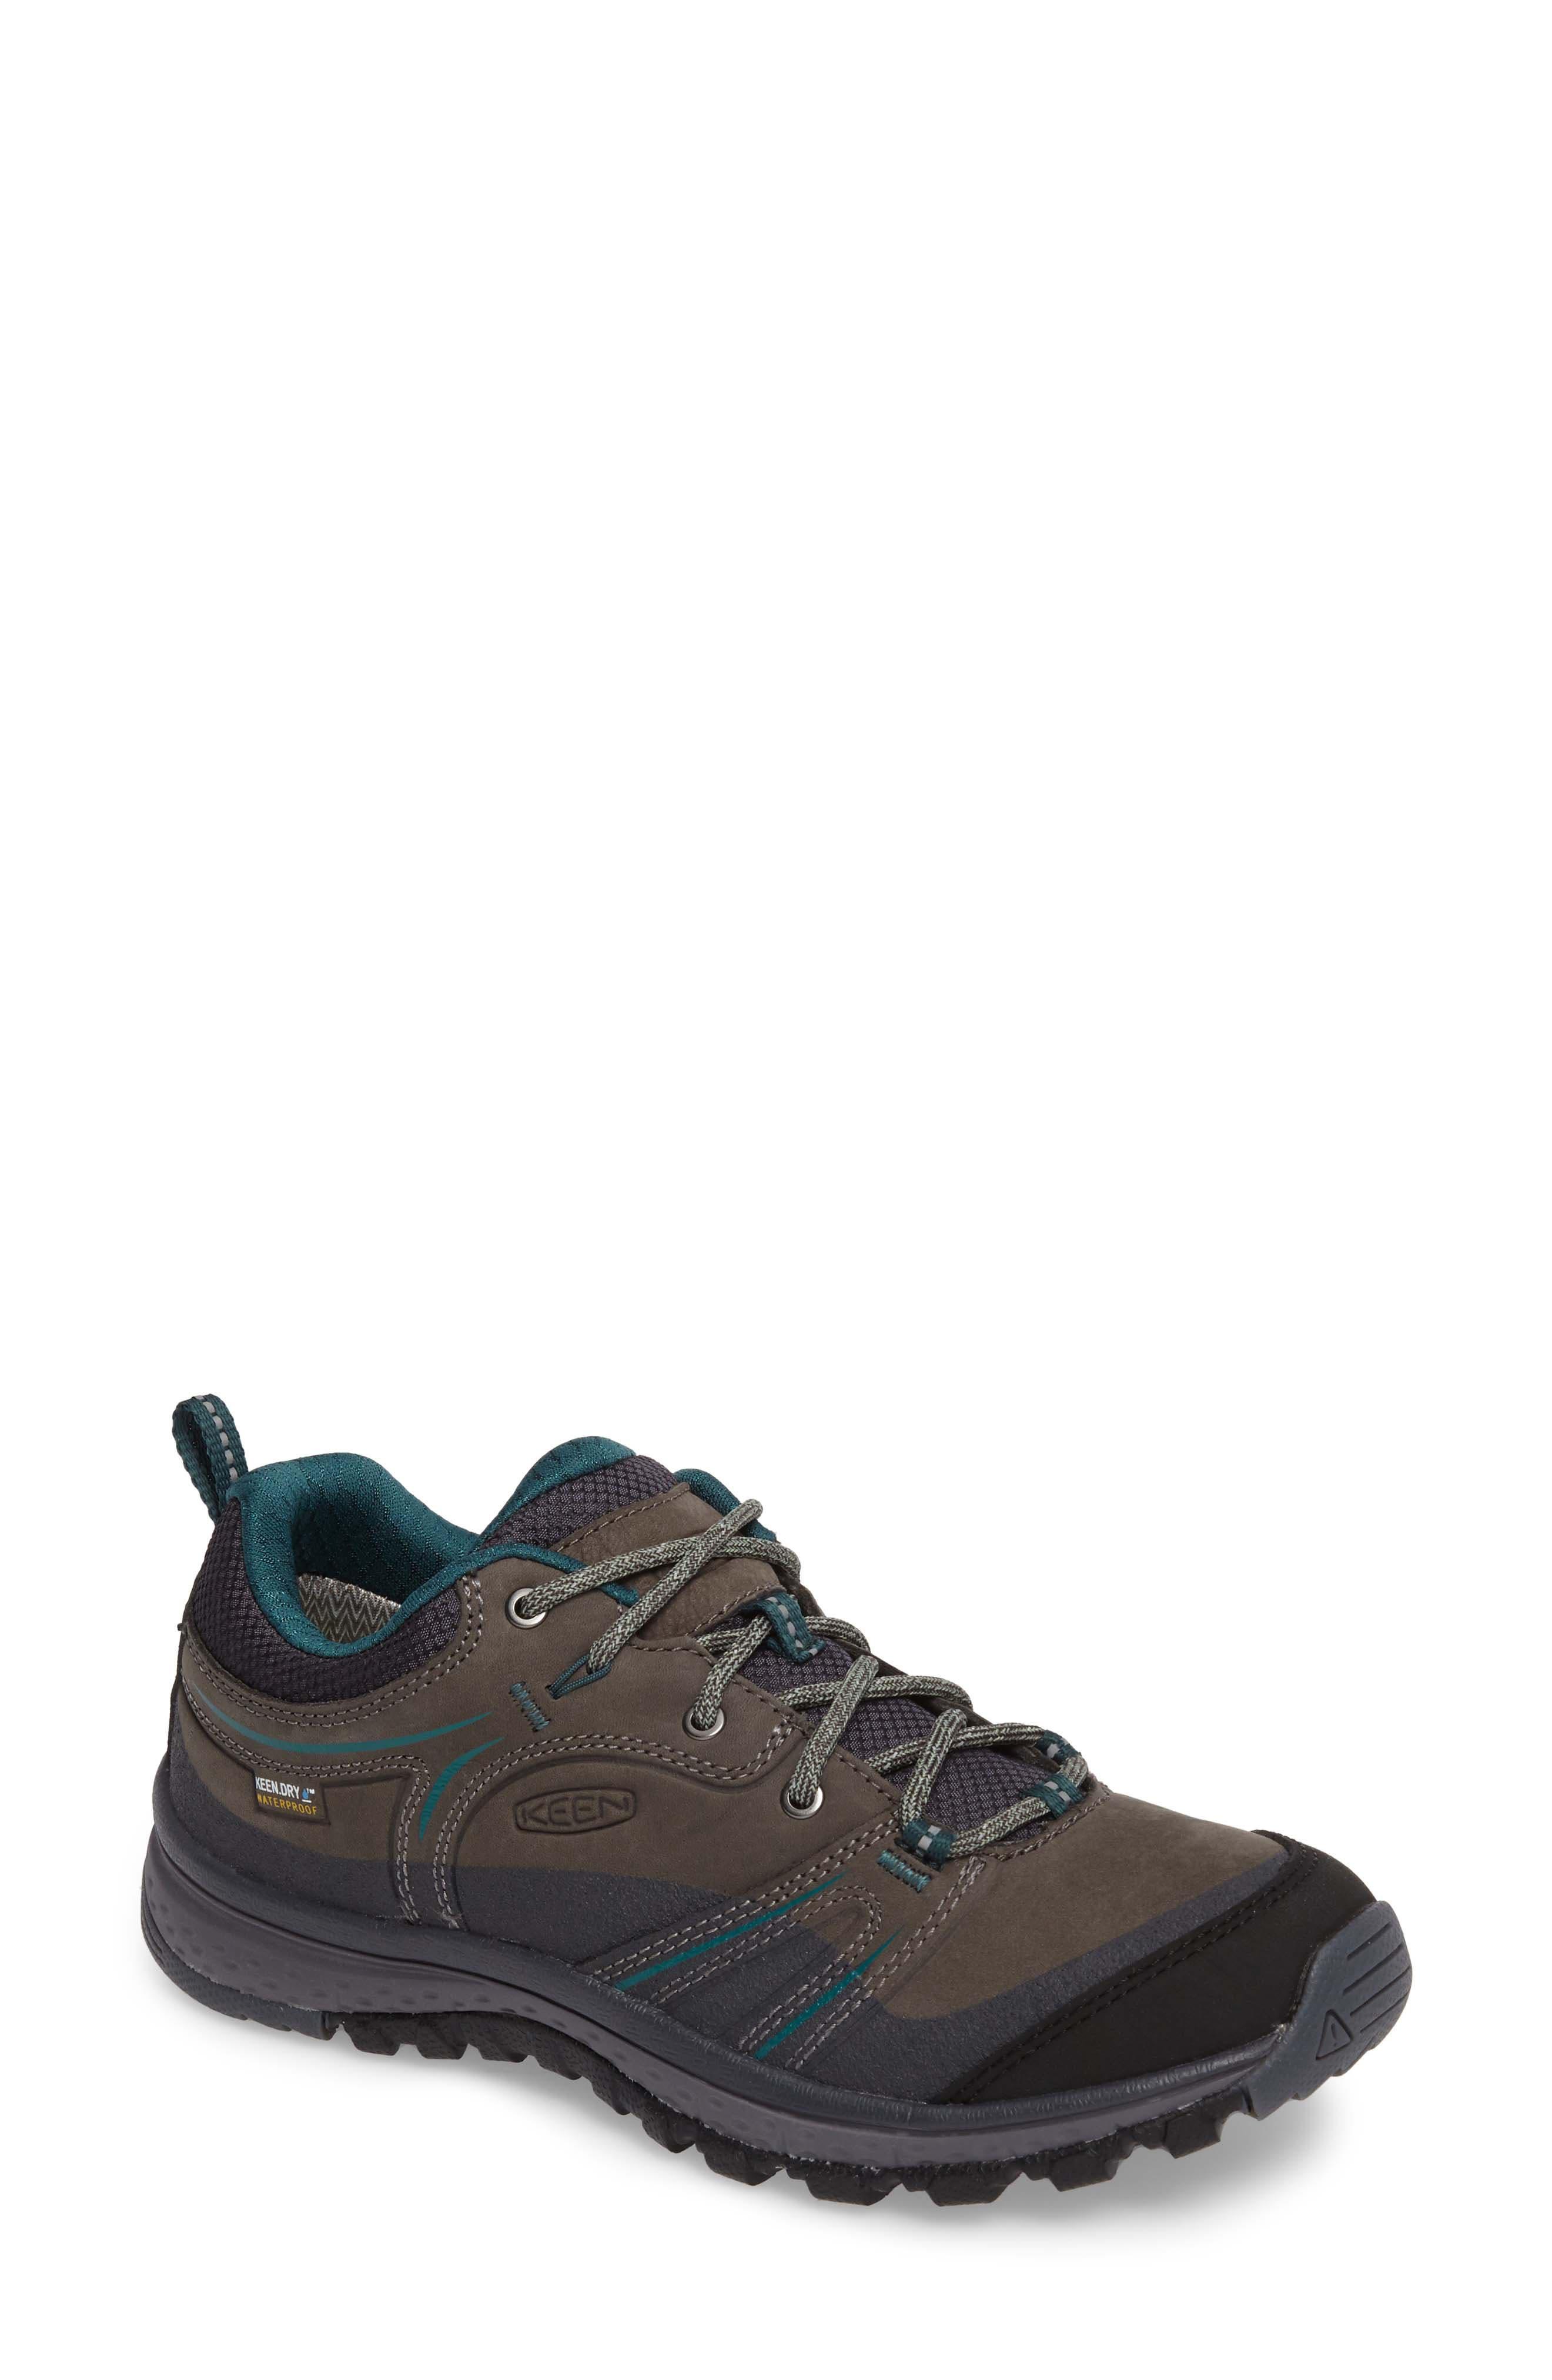 Terradora Waterproof Hiking Shoe,                             Main thumbnail 2, color,